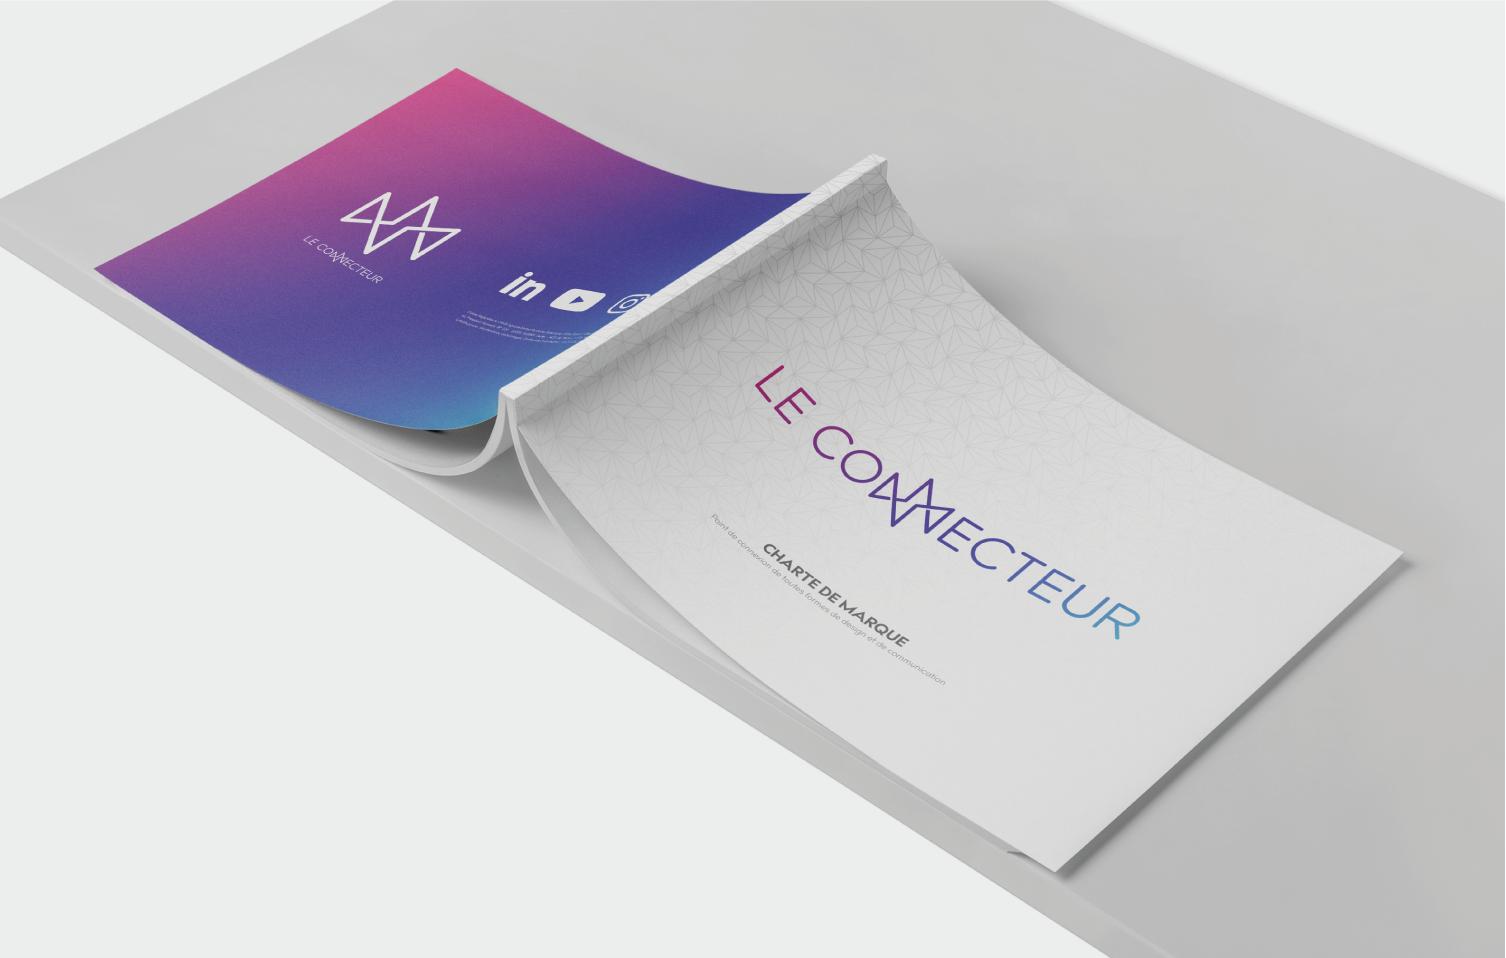 Brandbook-Le-Connecteur-A